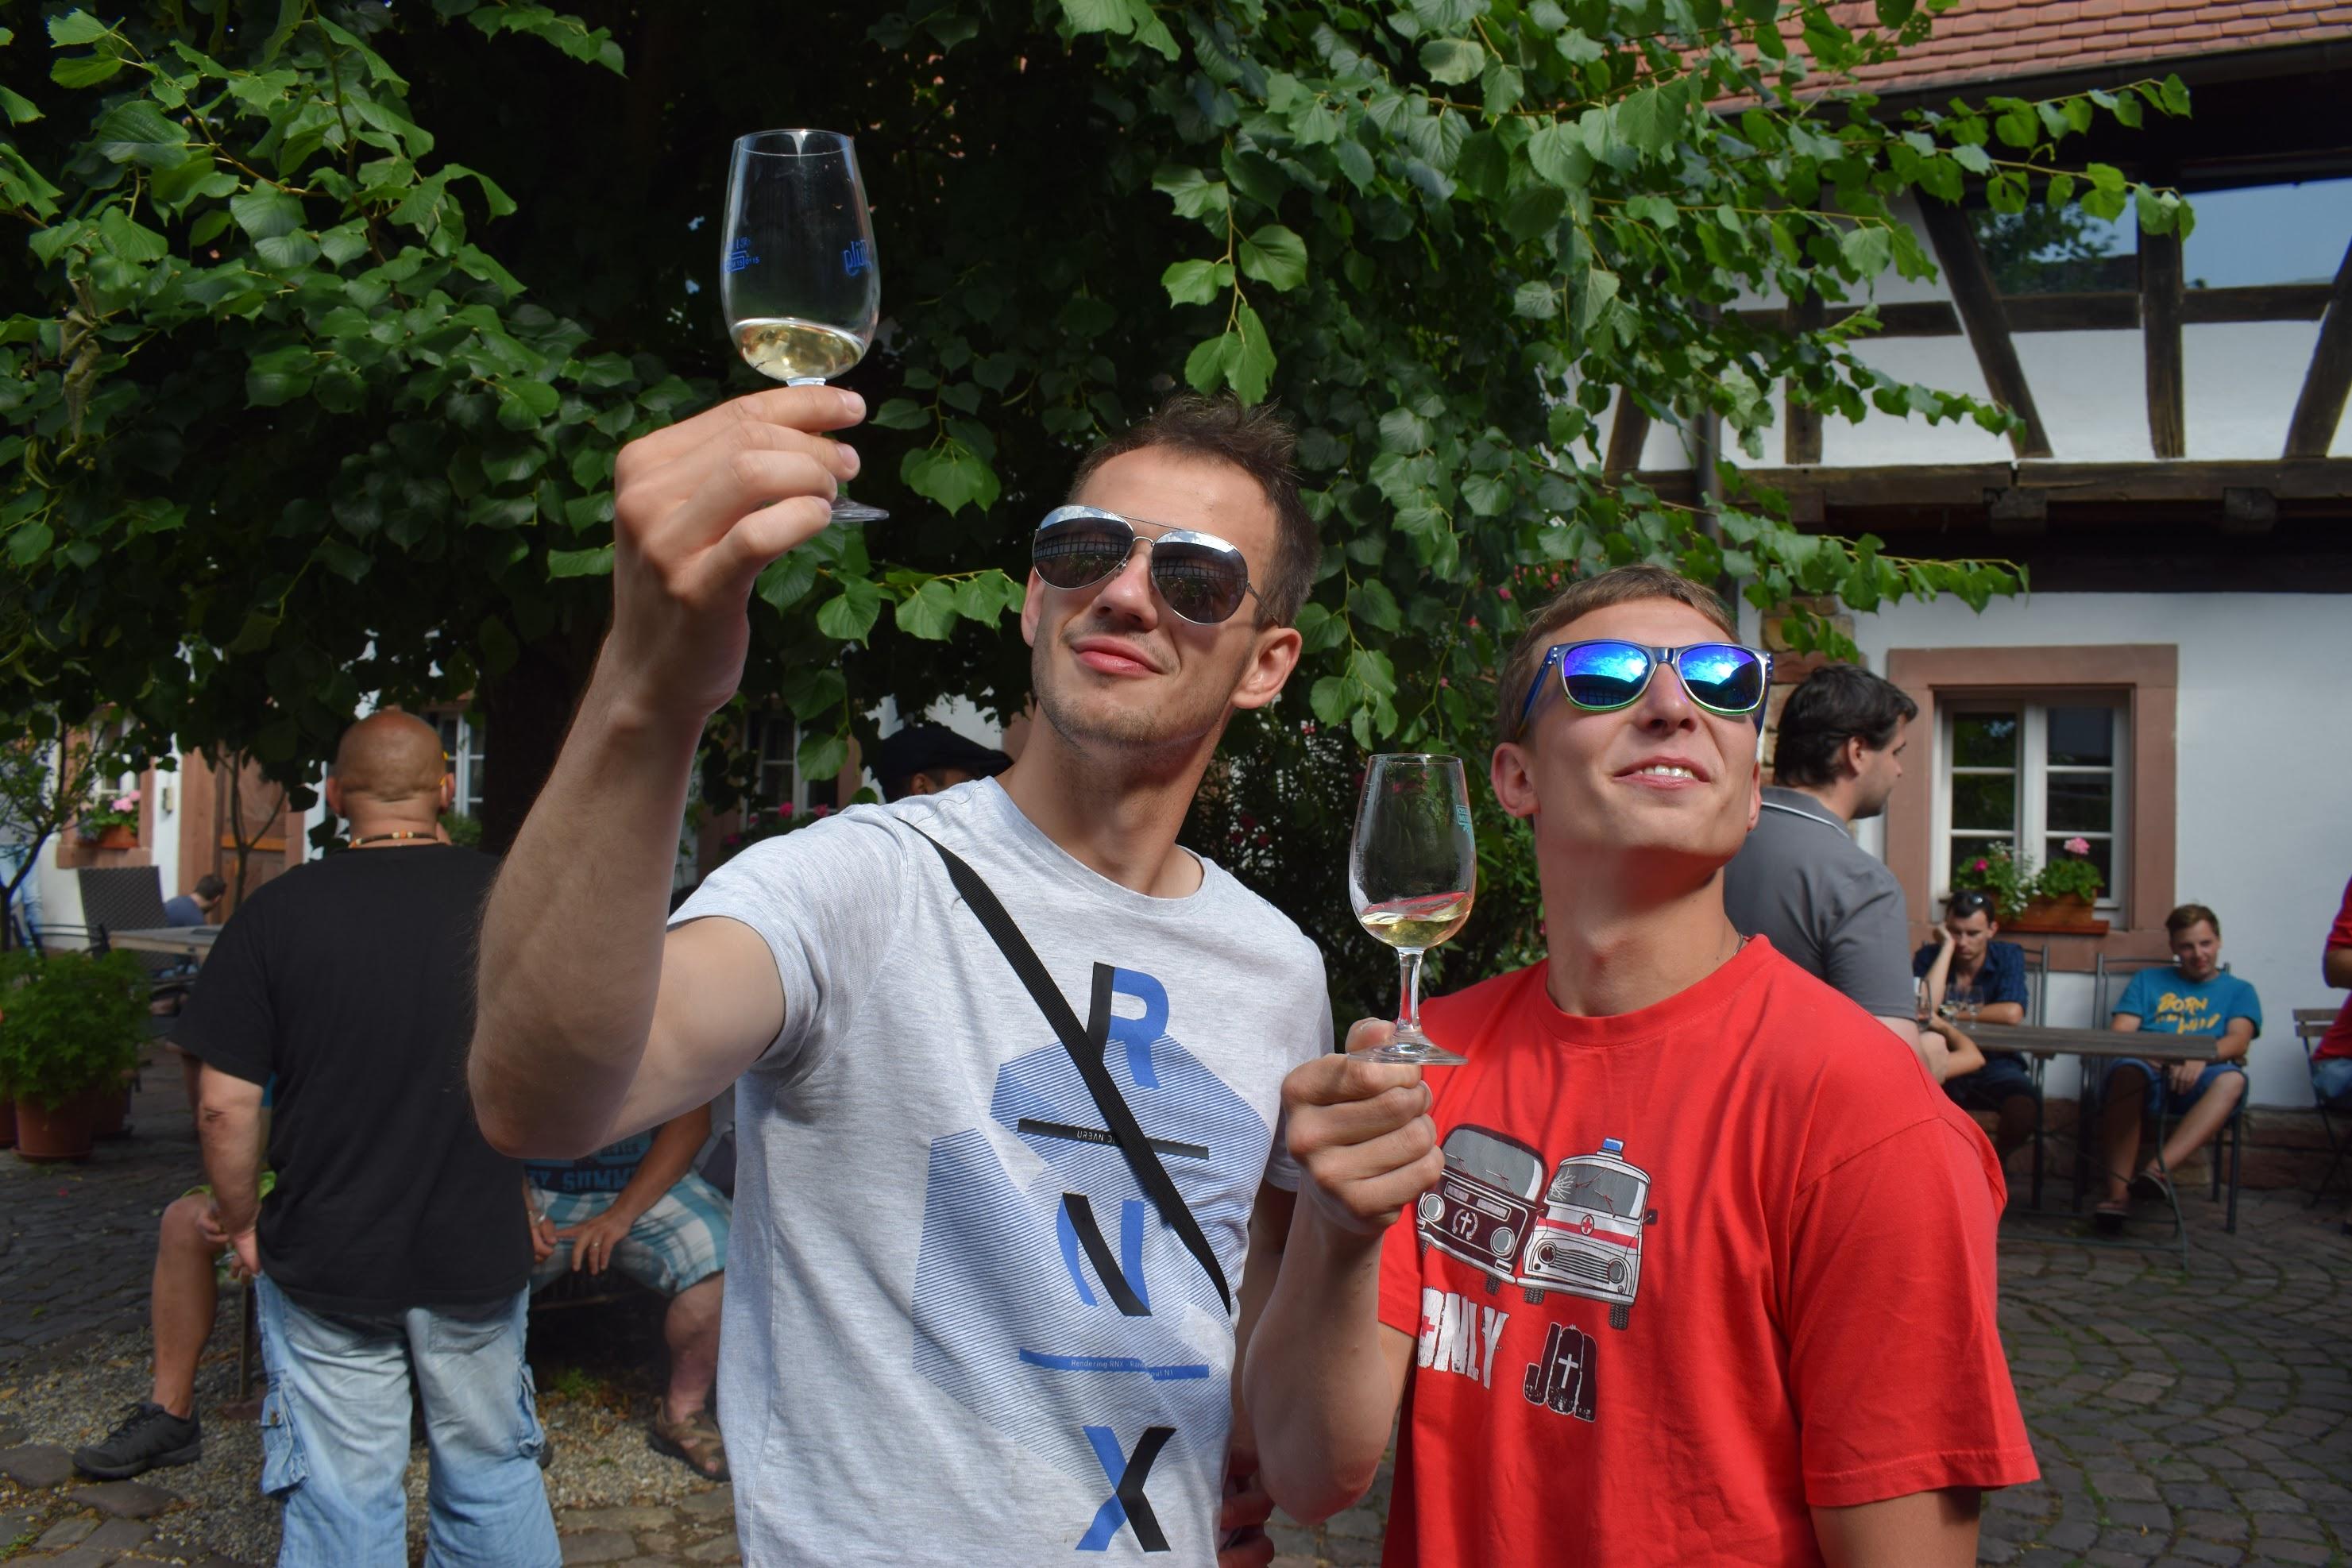 Festival Seebach